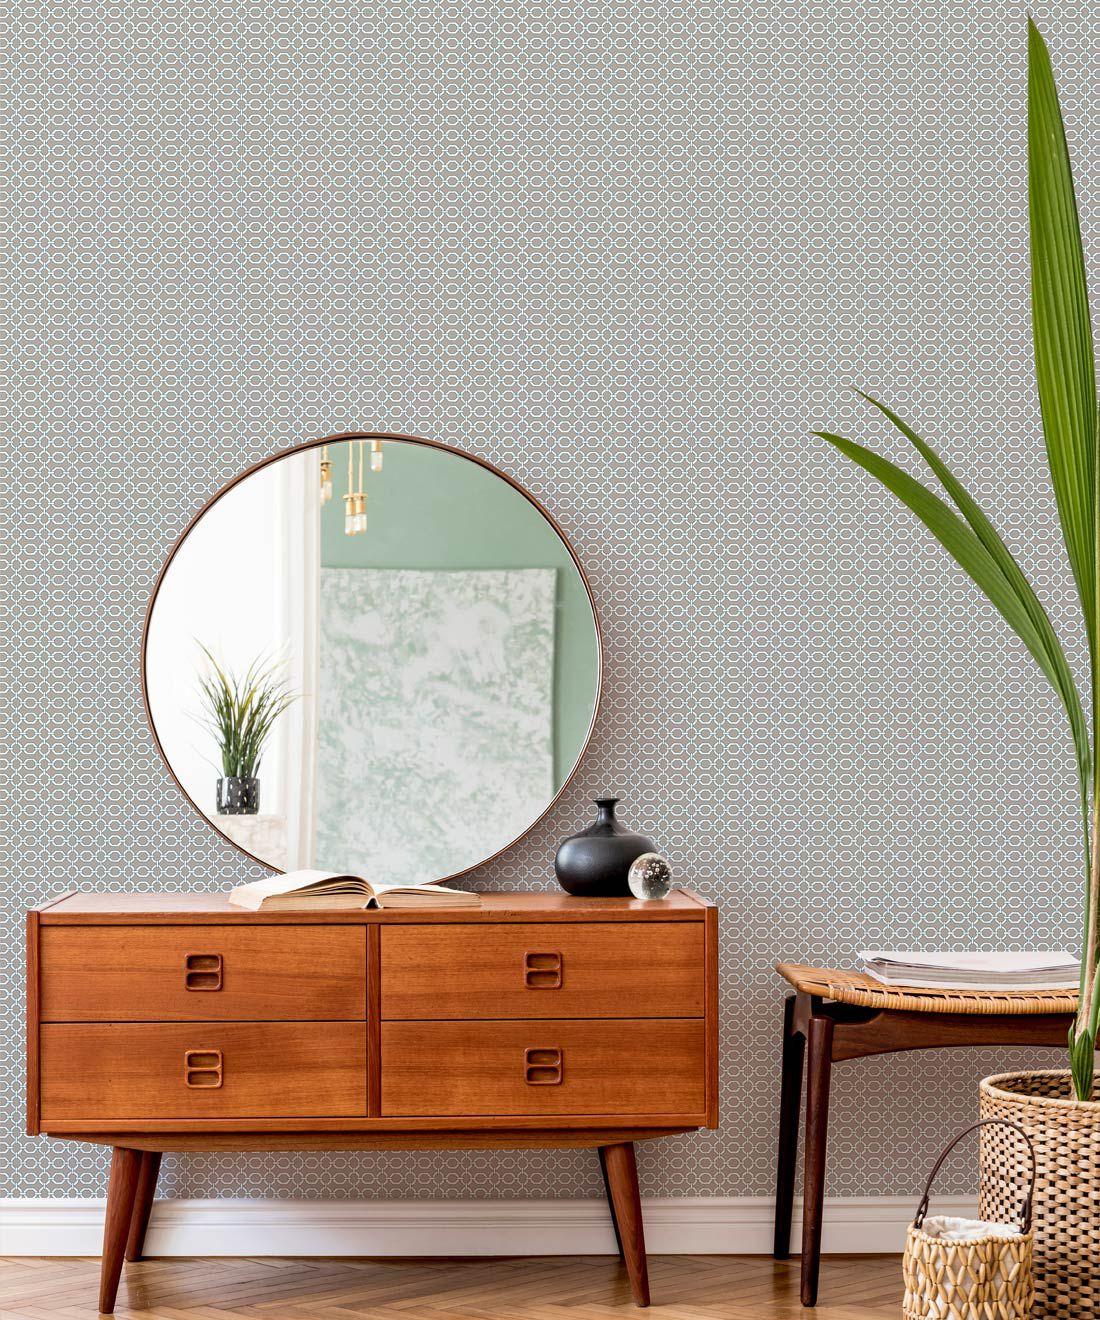 Ravello Wallpaper • Dianne Bergeron • Putty •Insitu